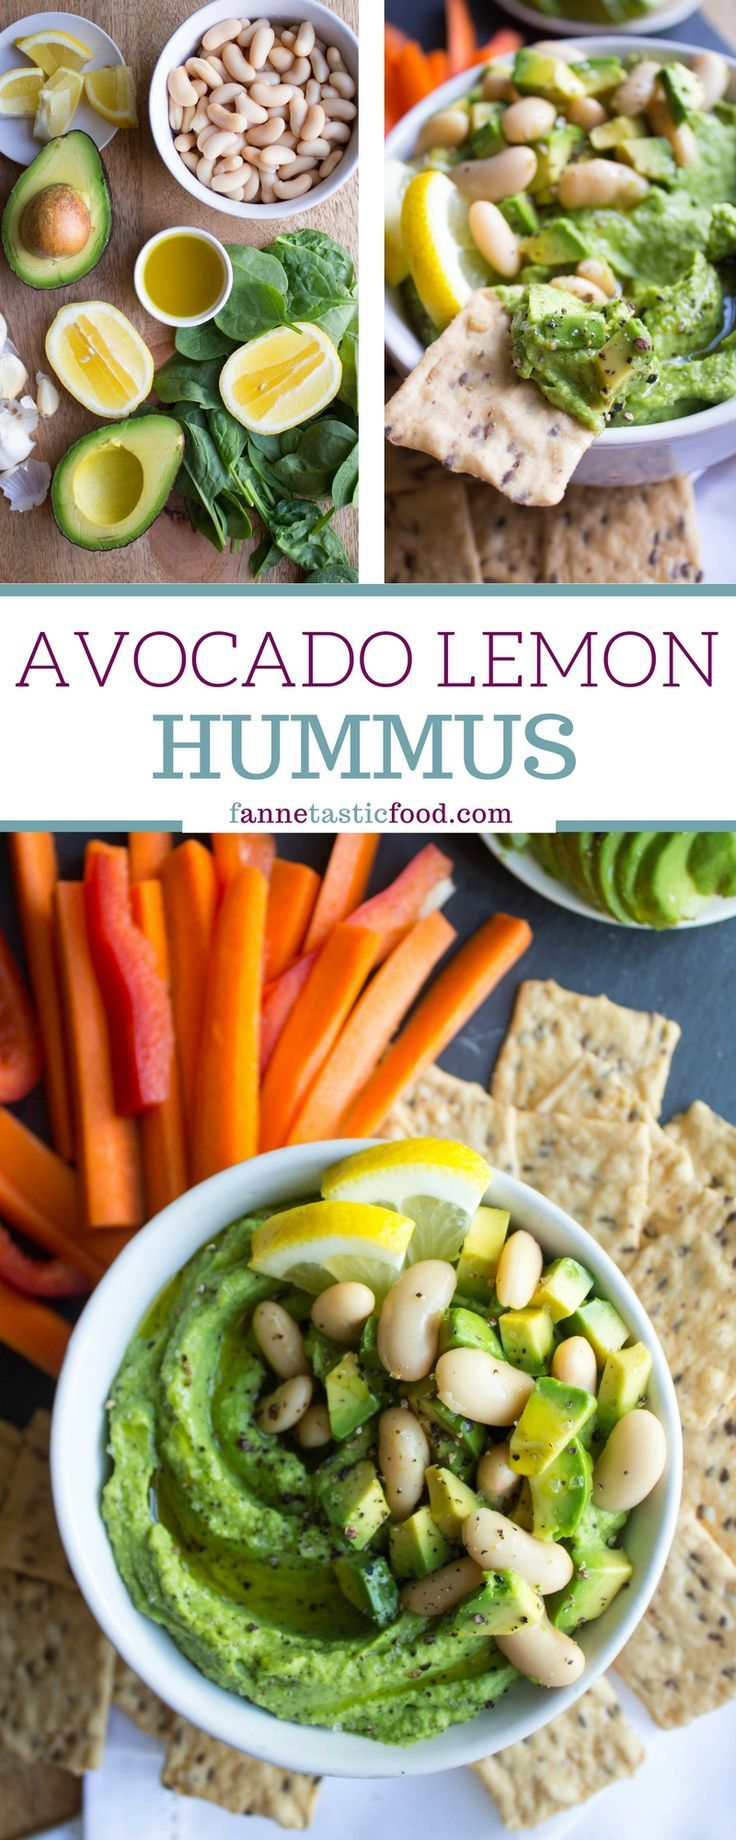 Avocado Lemon Hummus - a flavorful twist on hummus that packs in veggies and healthy fat!   hummus recipe   avocado hummus recipe   easy hummus recipe   vegan snack ideas  